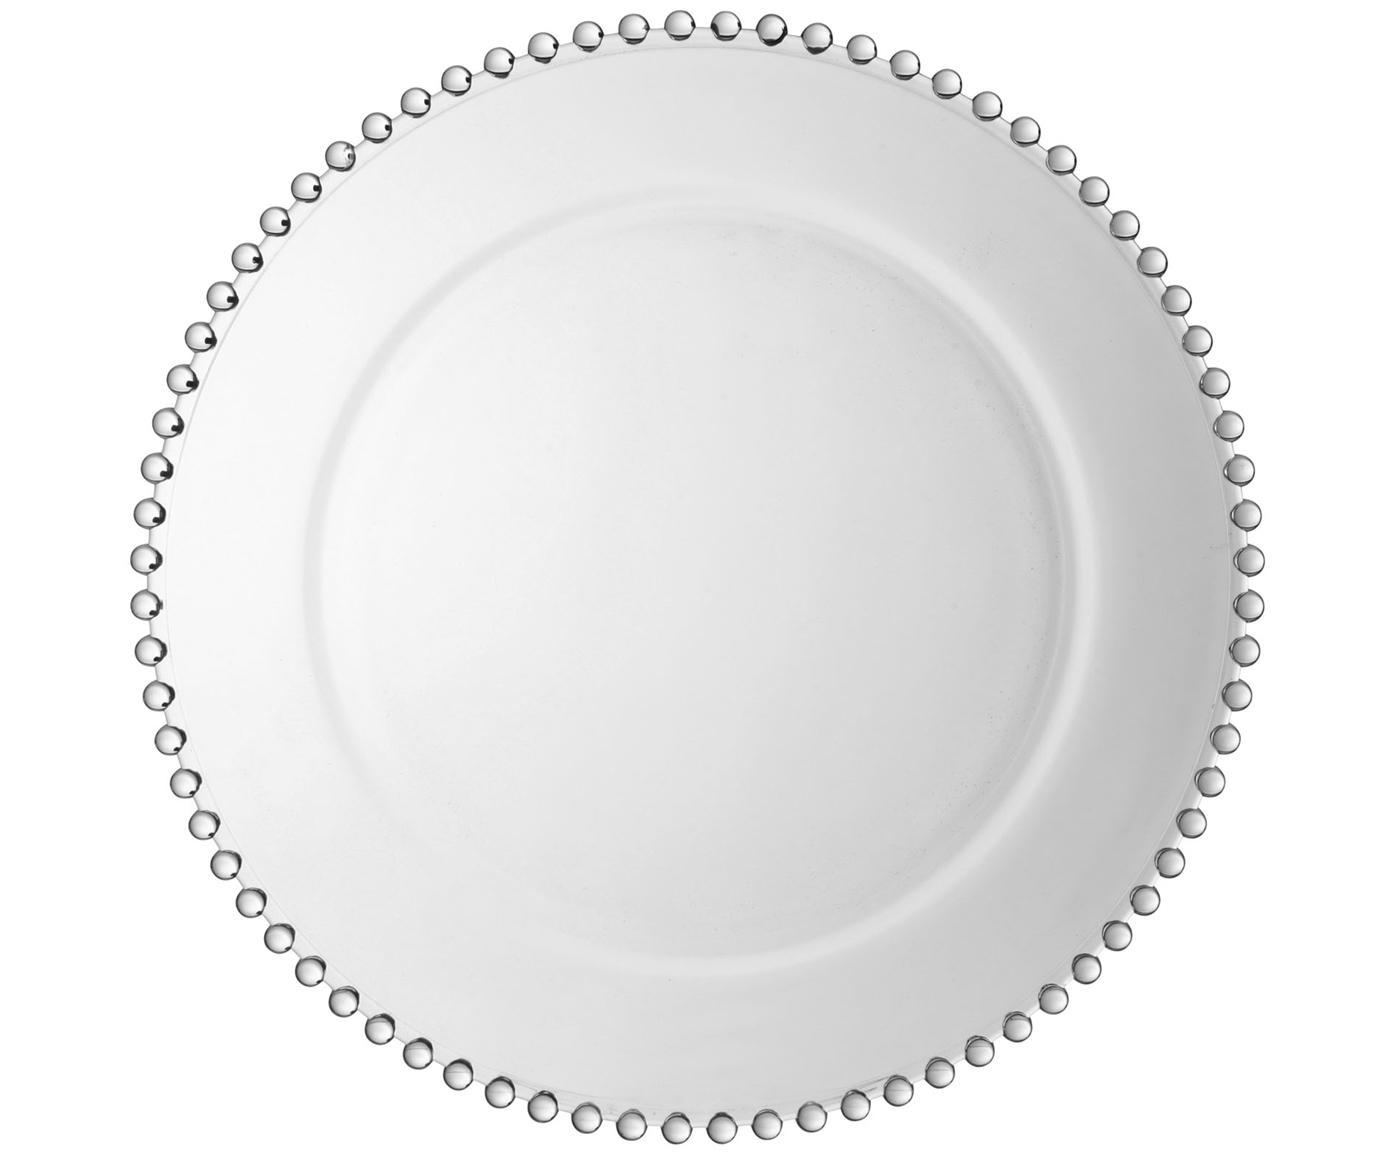 Onderbord Perles, Glas, Transparant, Ø 33 cm